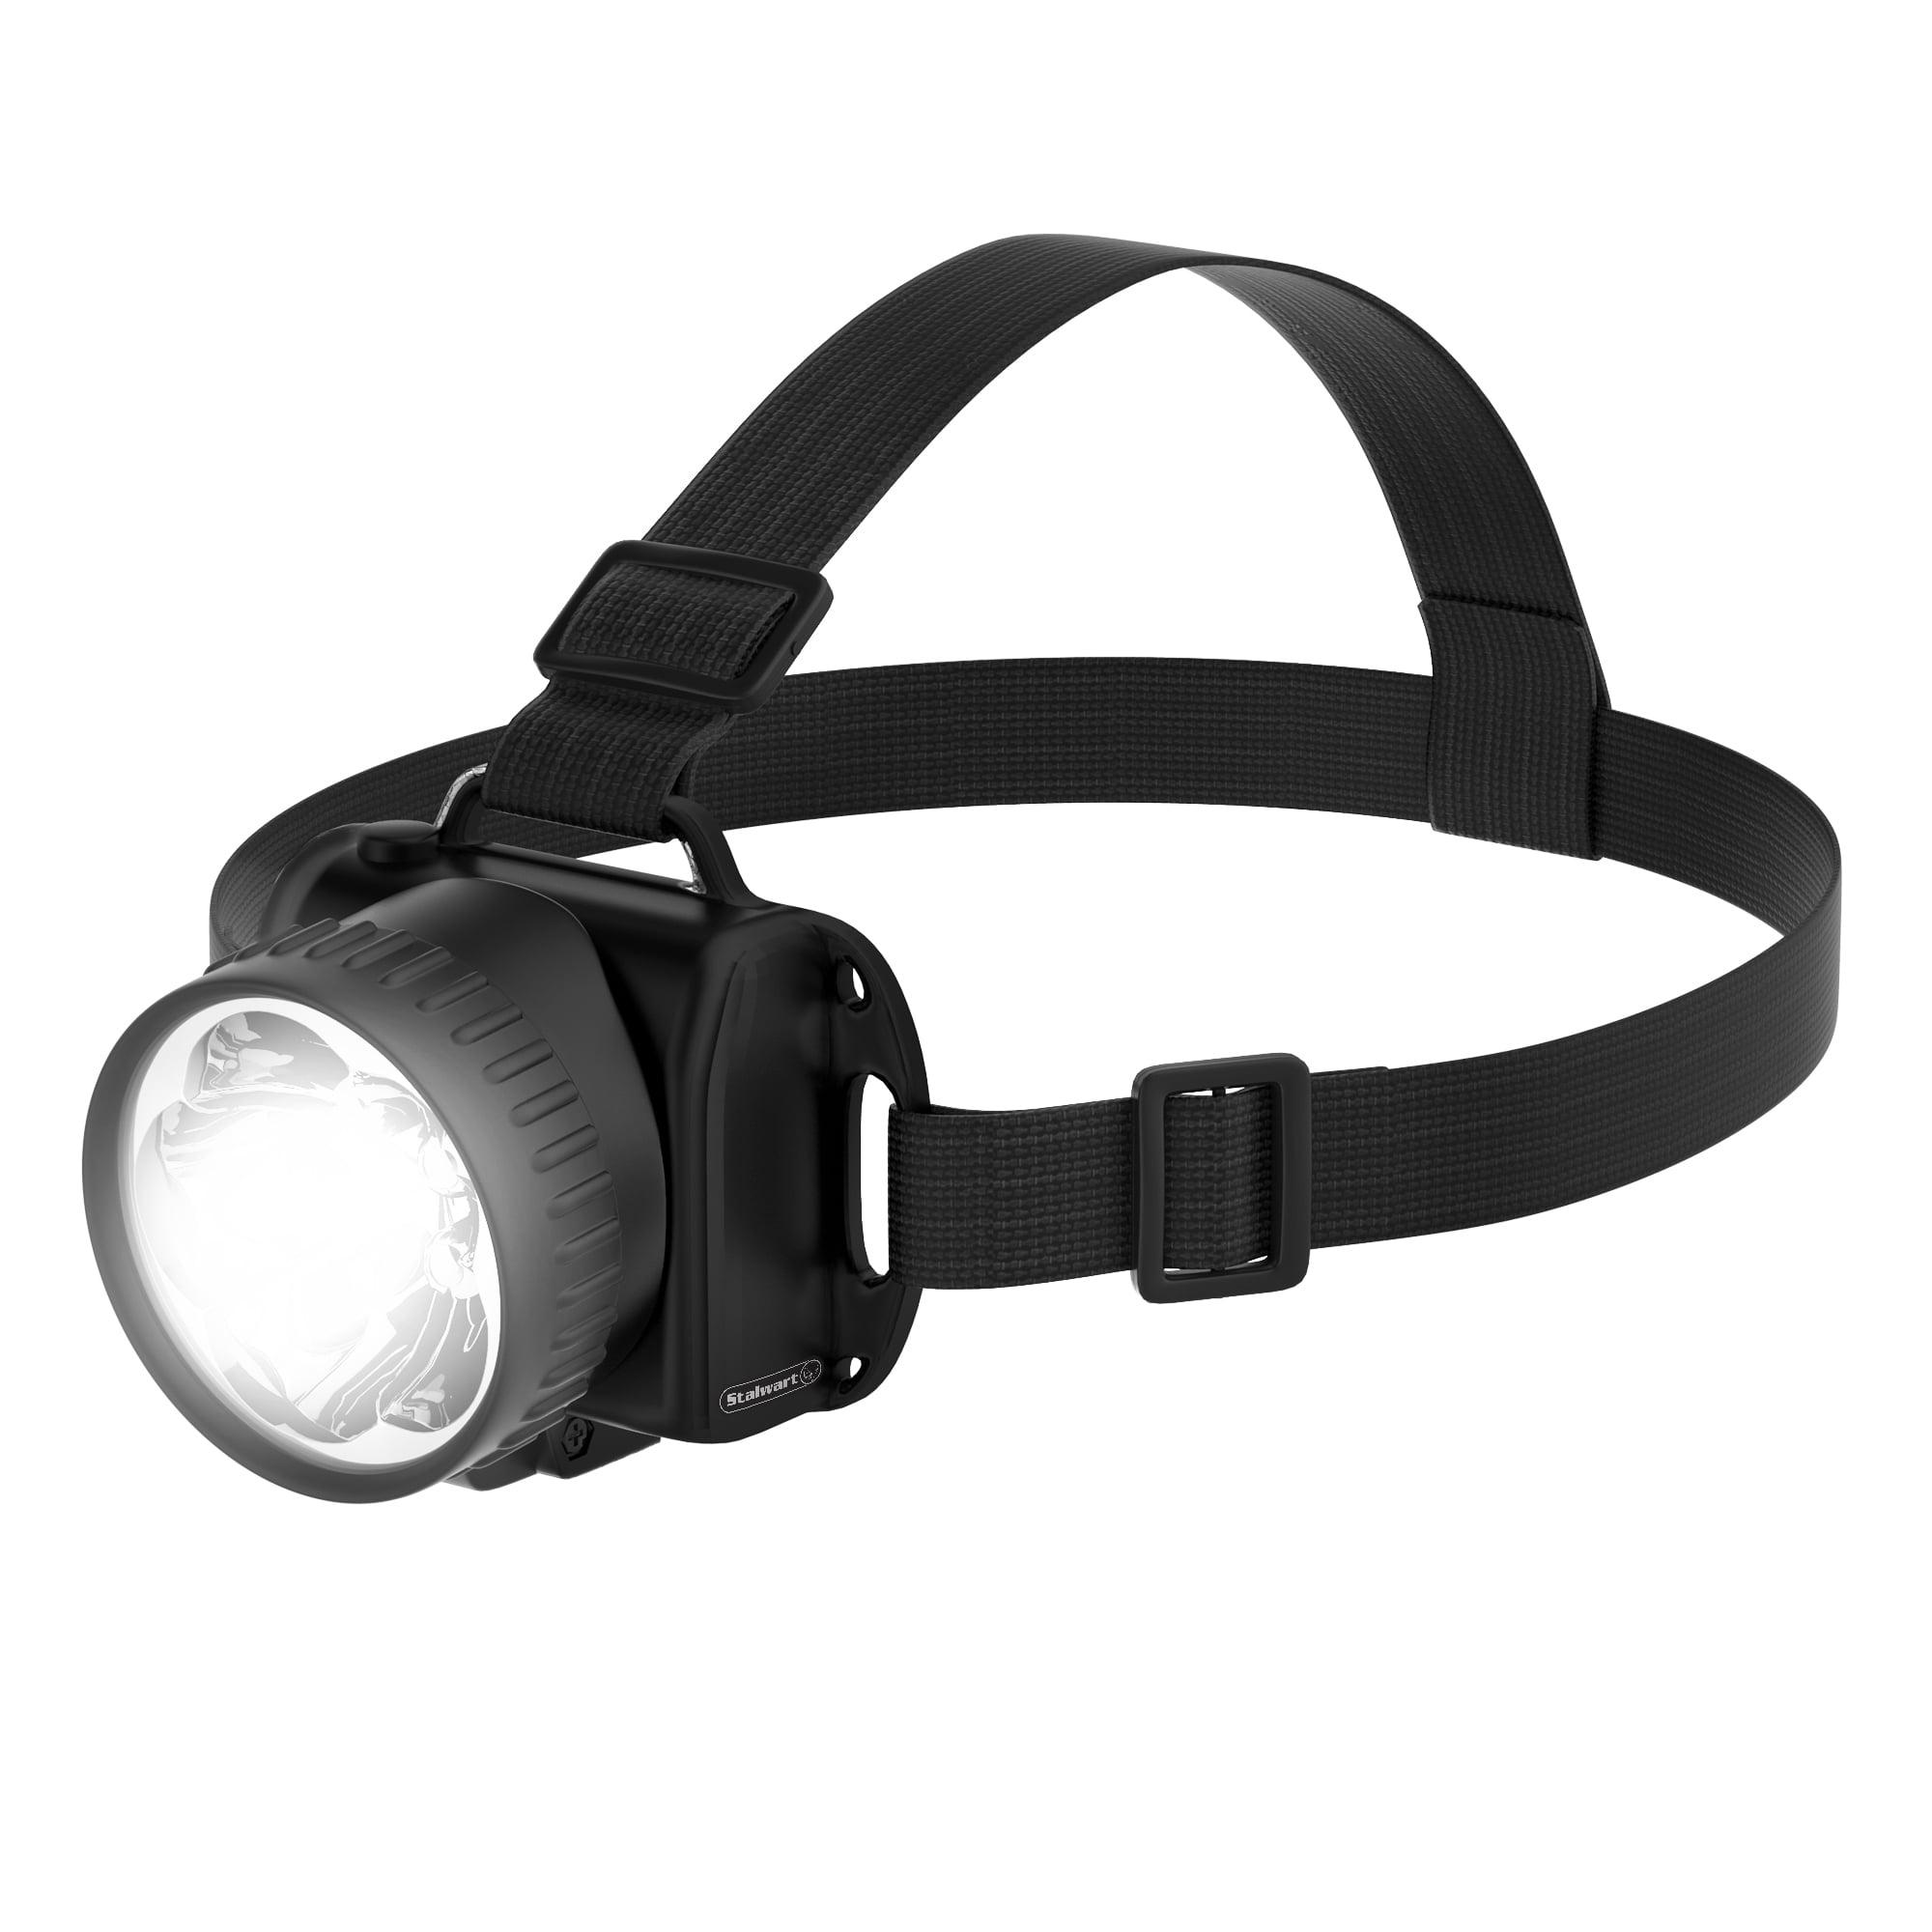 Super Bright 5-LED Headlamp with Adjustable Strap